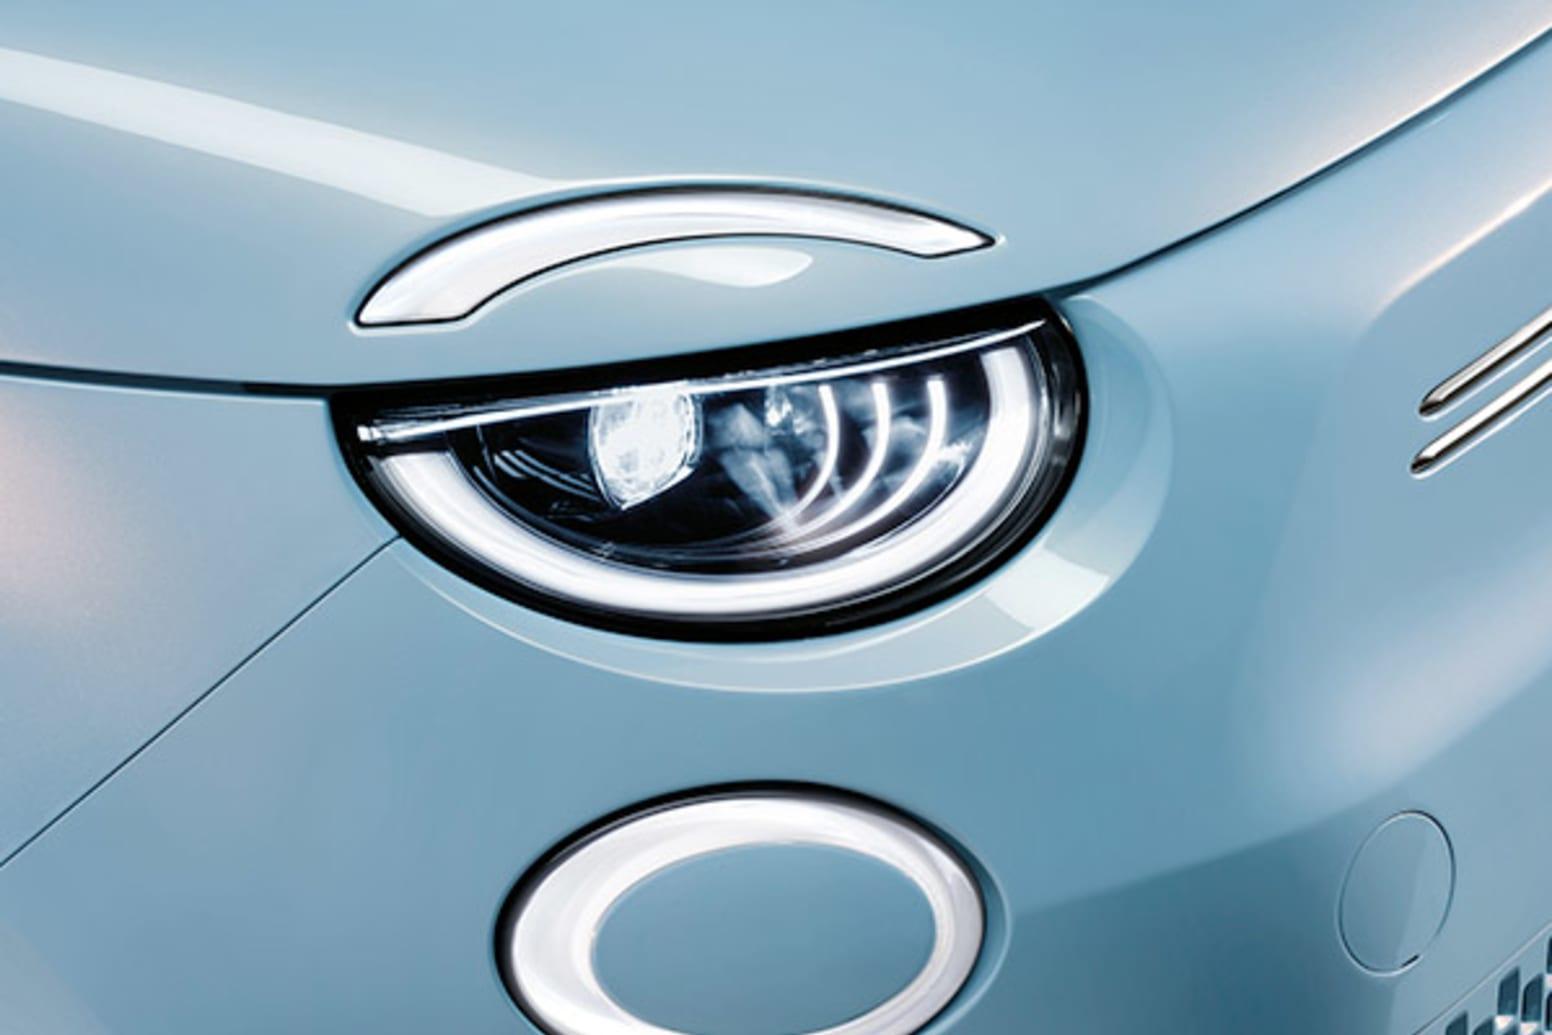 Iconic Design: Infinity Lights